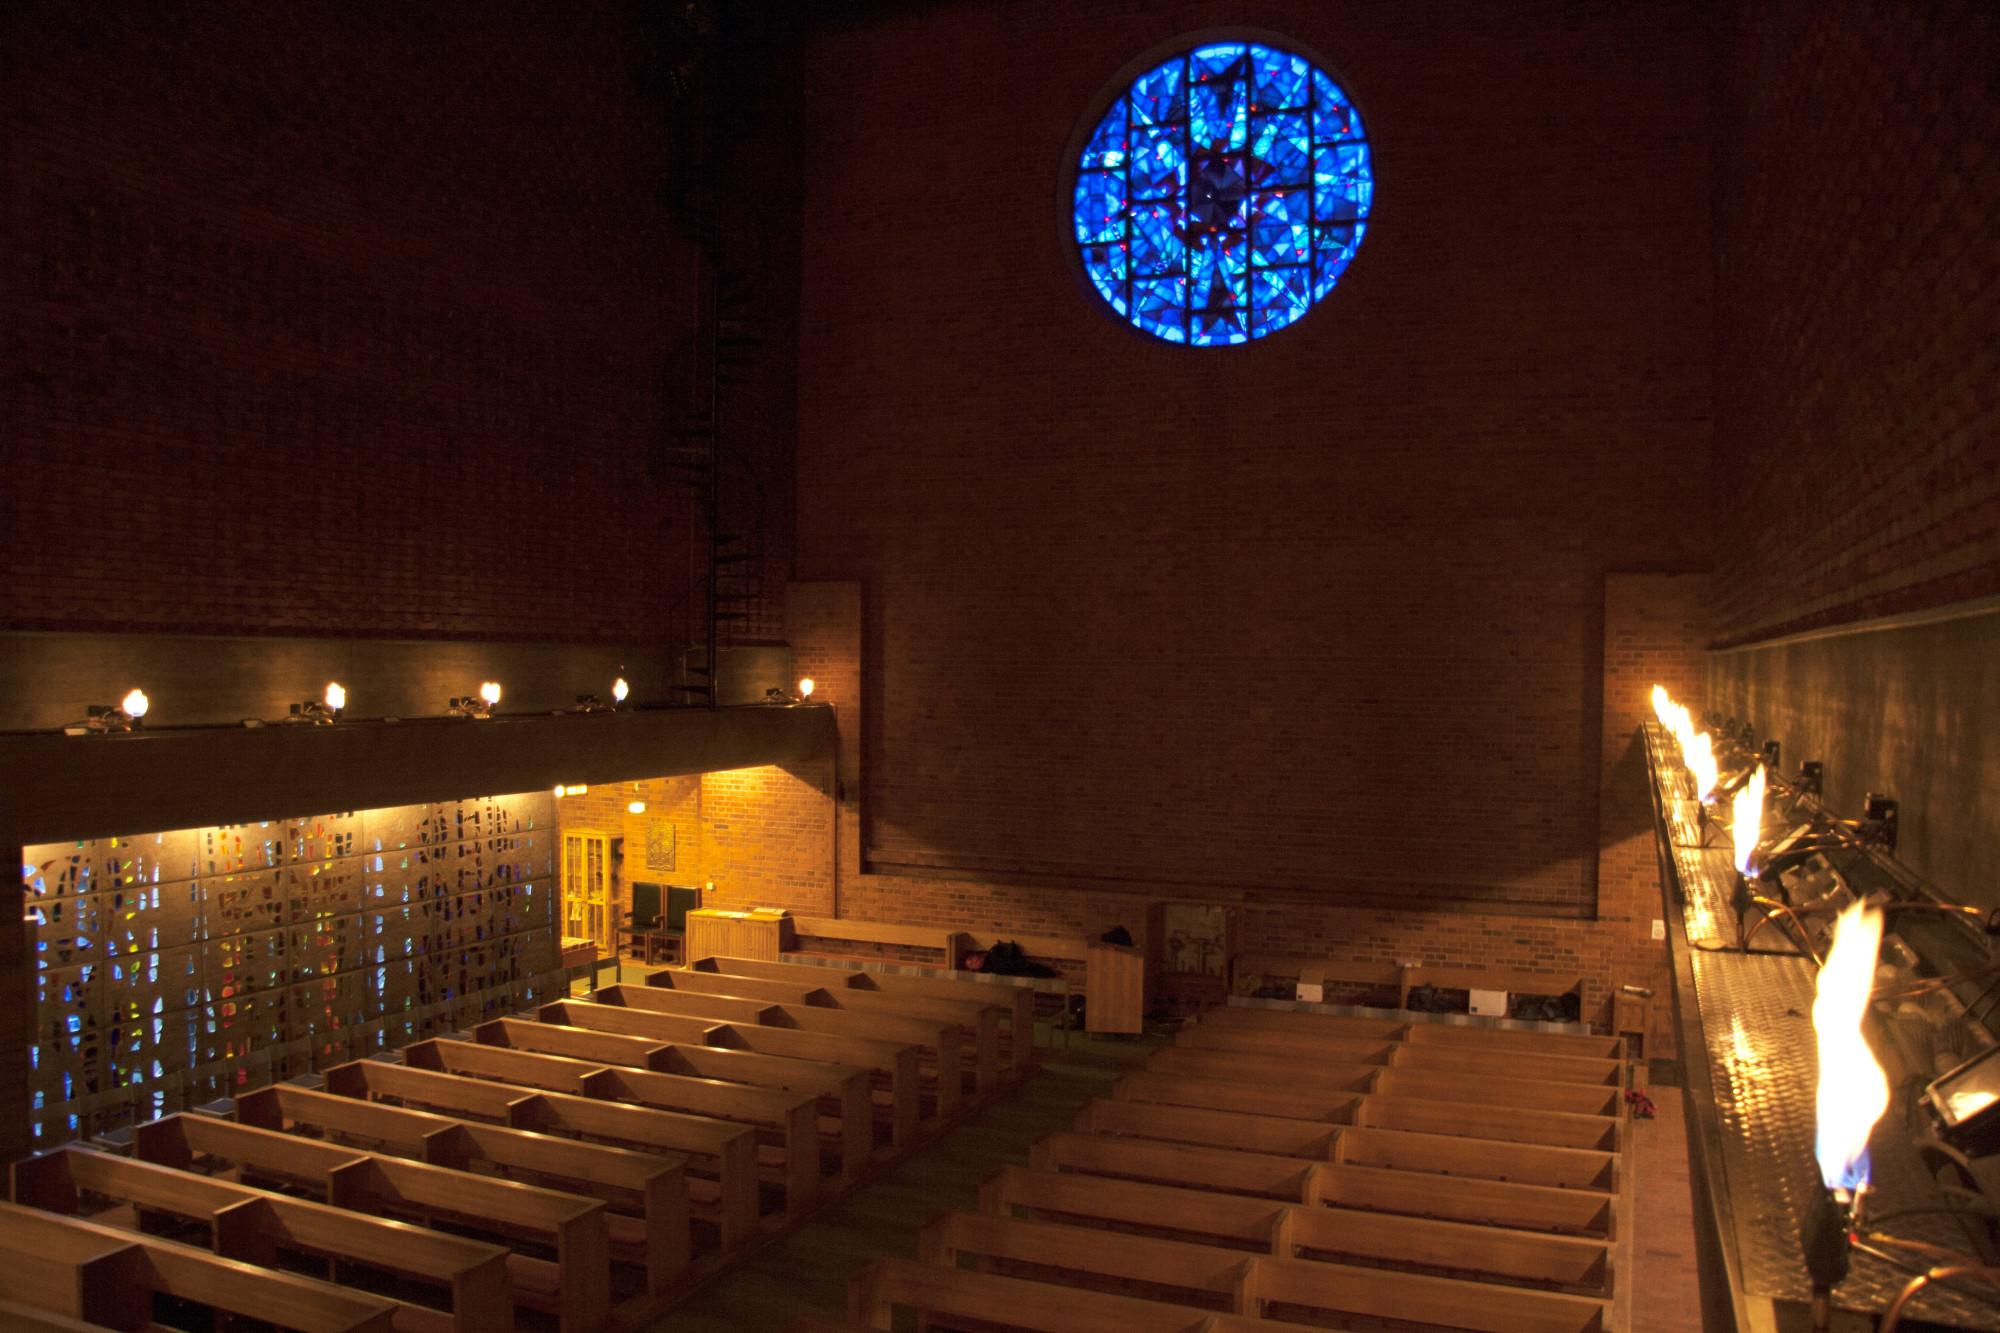 Totalt 21 gasfacklor lyser upp kyrkosalen.